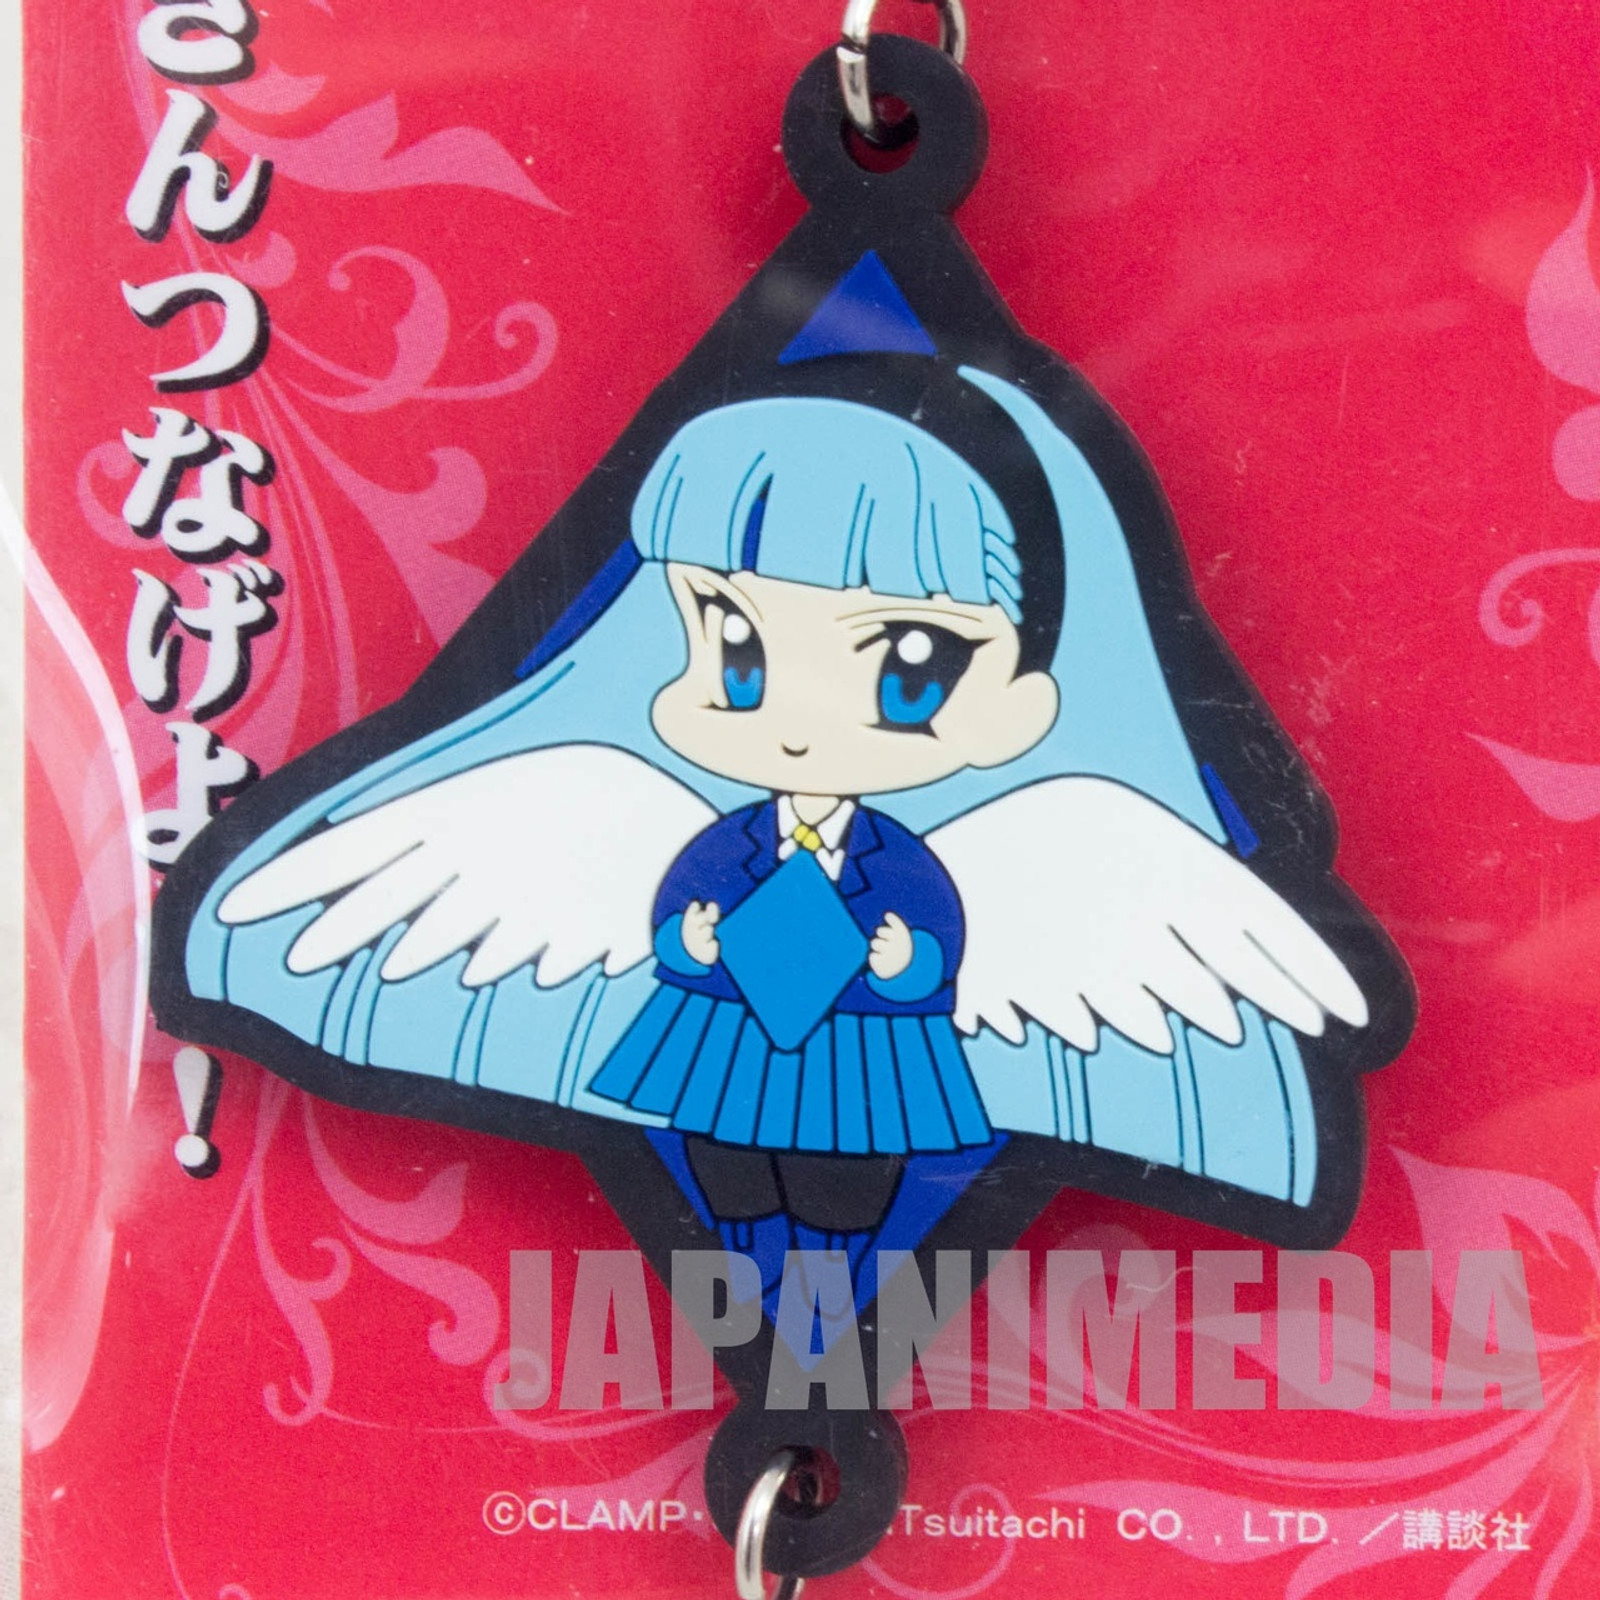 Magic Knight Rayearth Umi Ryuzaki Mascot Rubber Strap CLAMP JAPAN ANIME